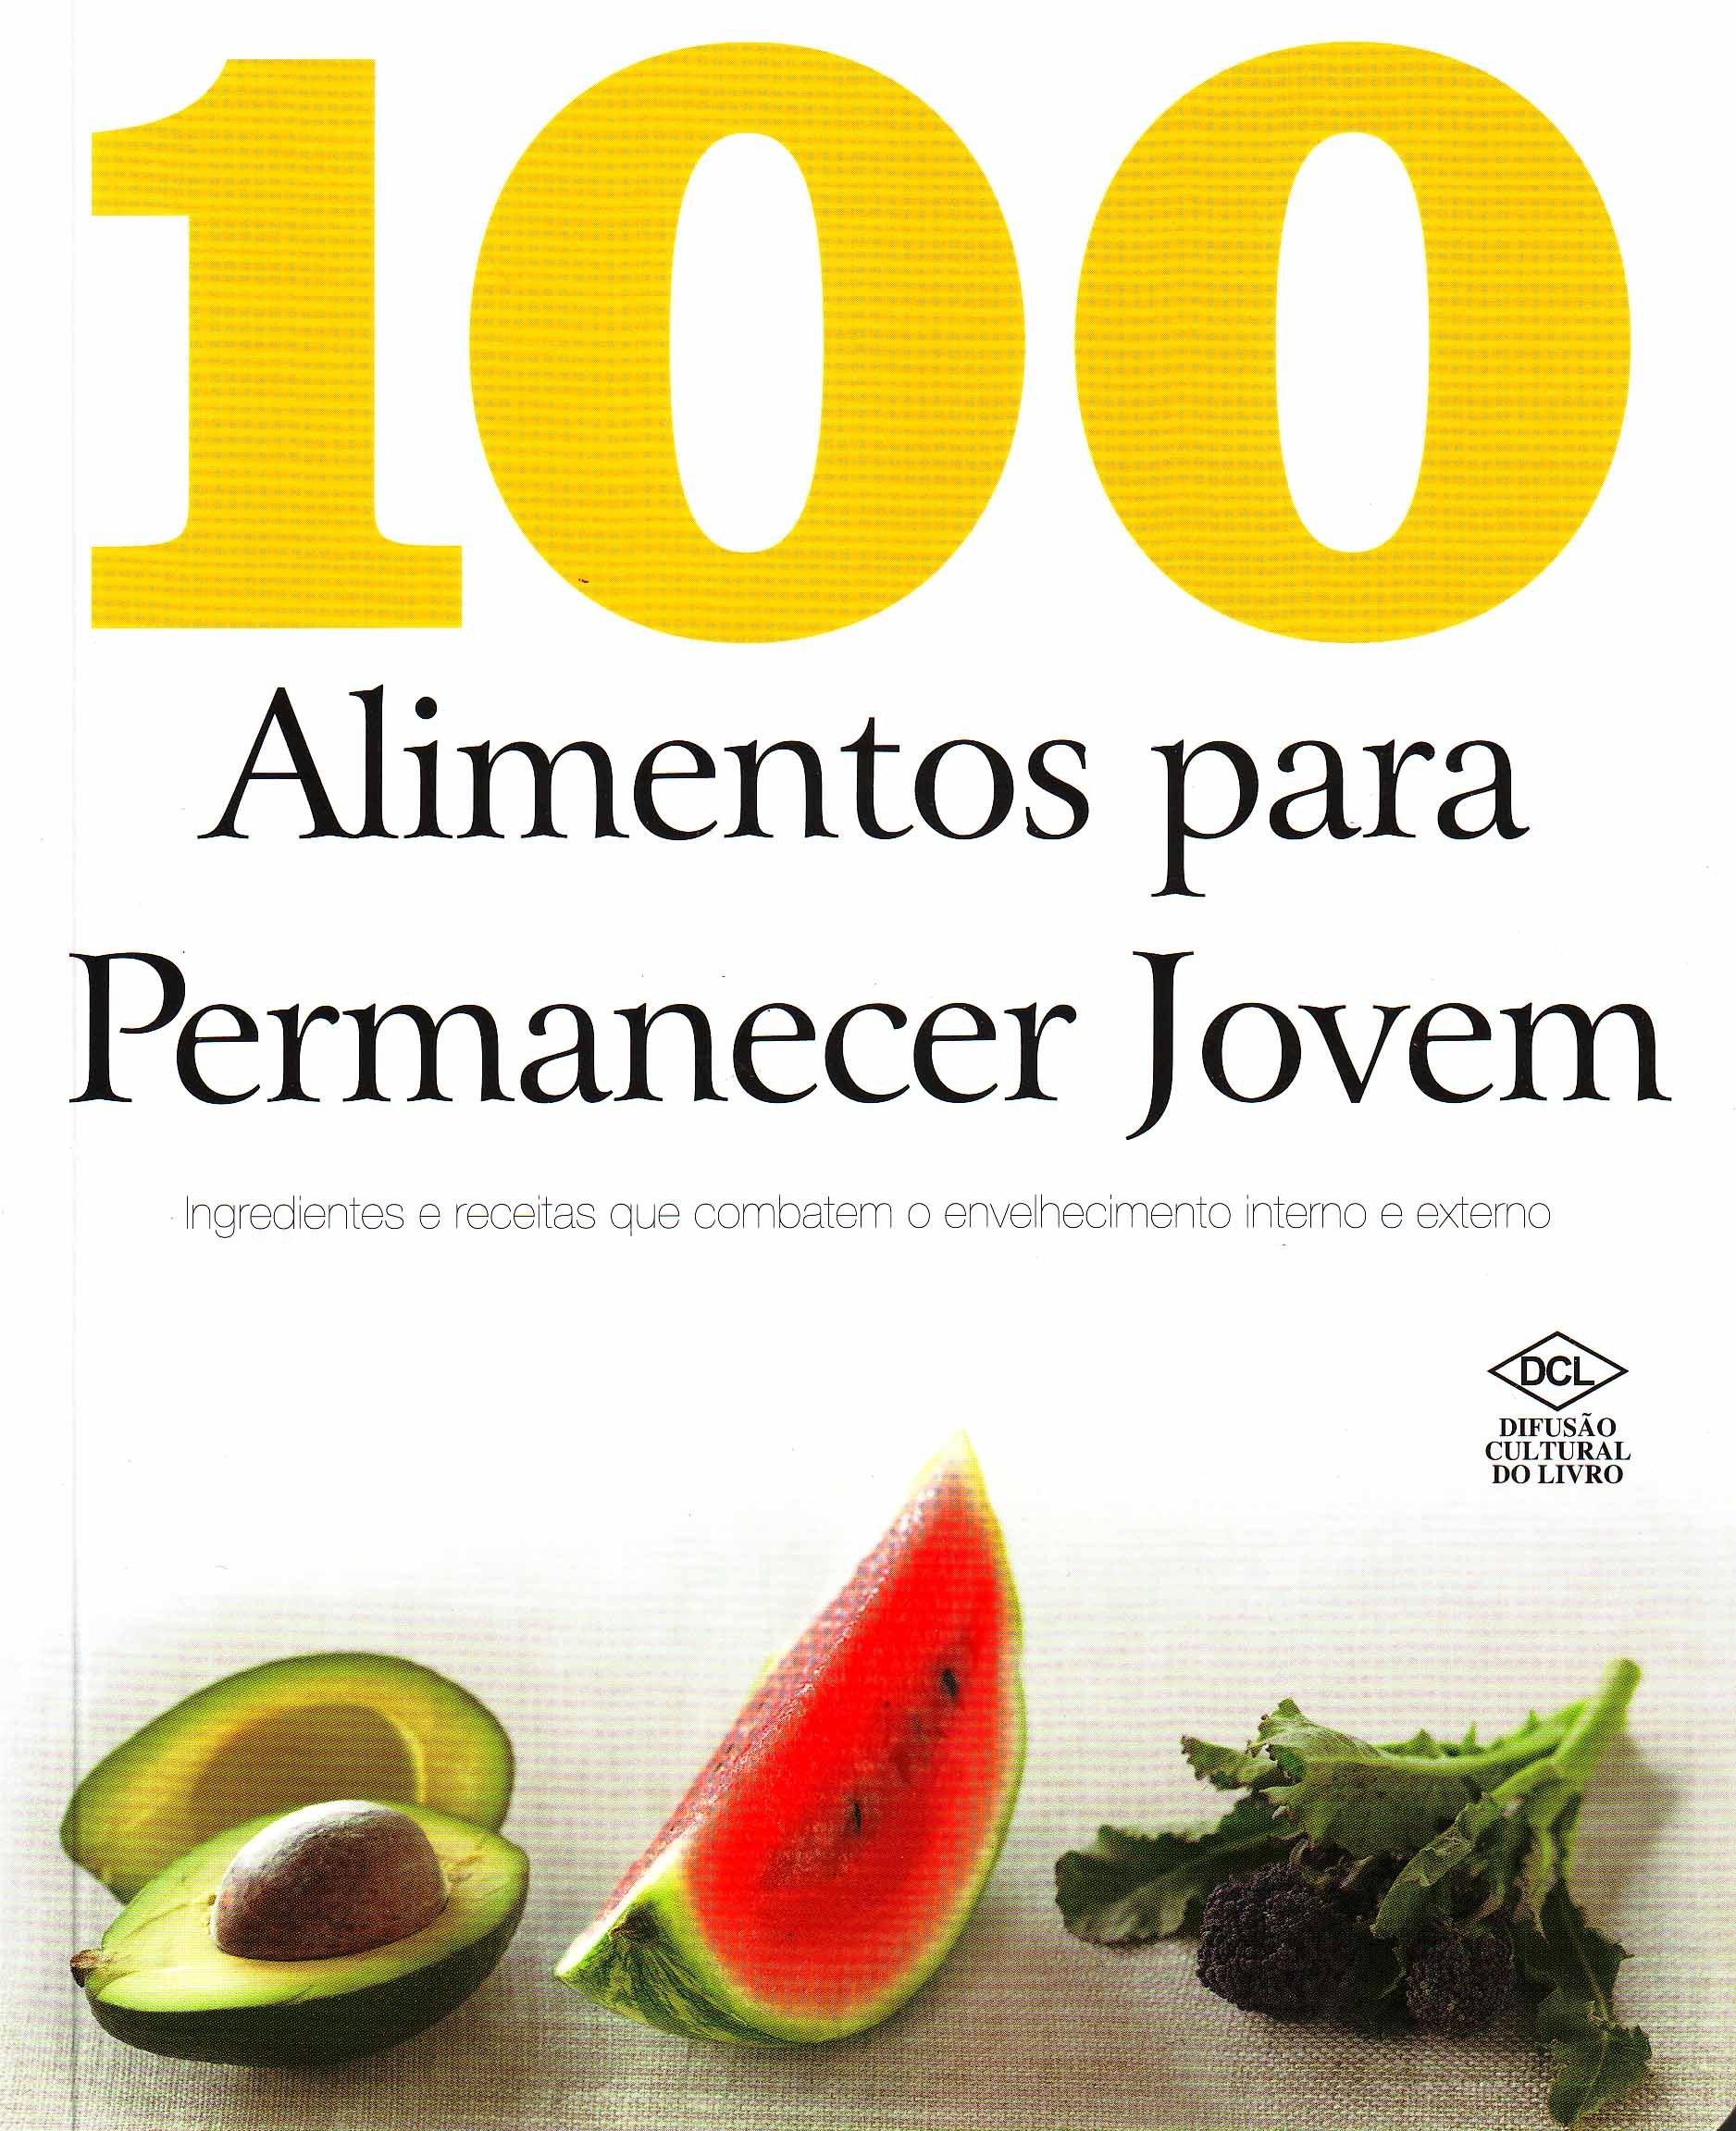 100 Alimentos Para Permanecer Jovem (Em Portuguese do Brasil): Charlote Watts: 9788536811321: Amazon.com: Books